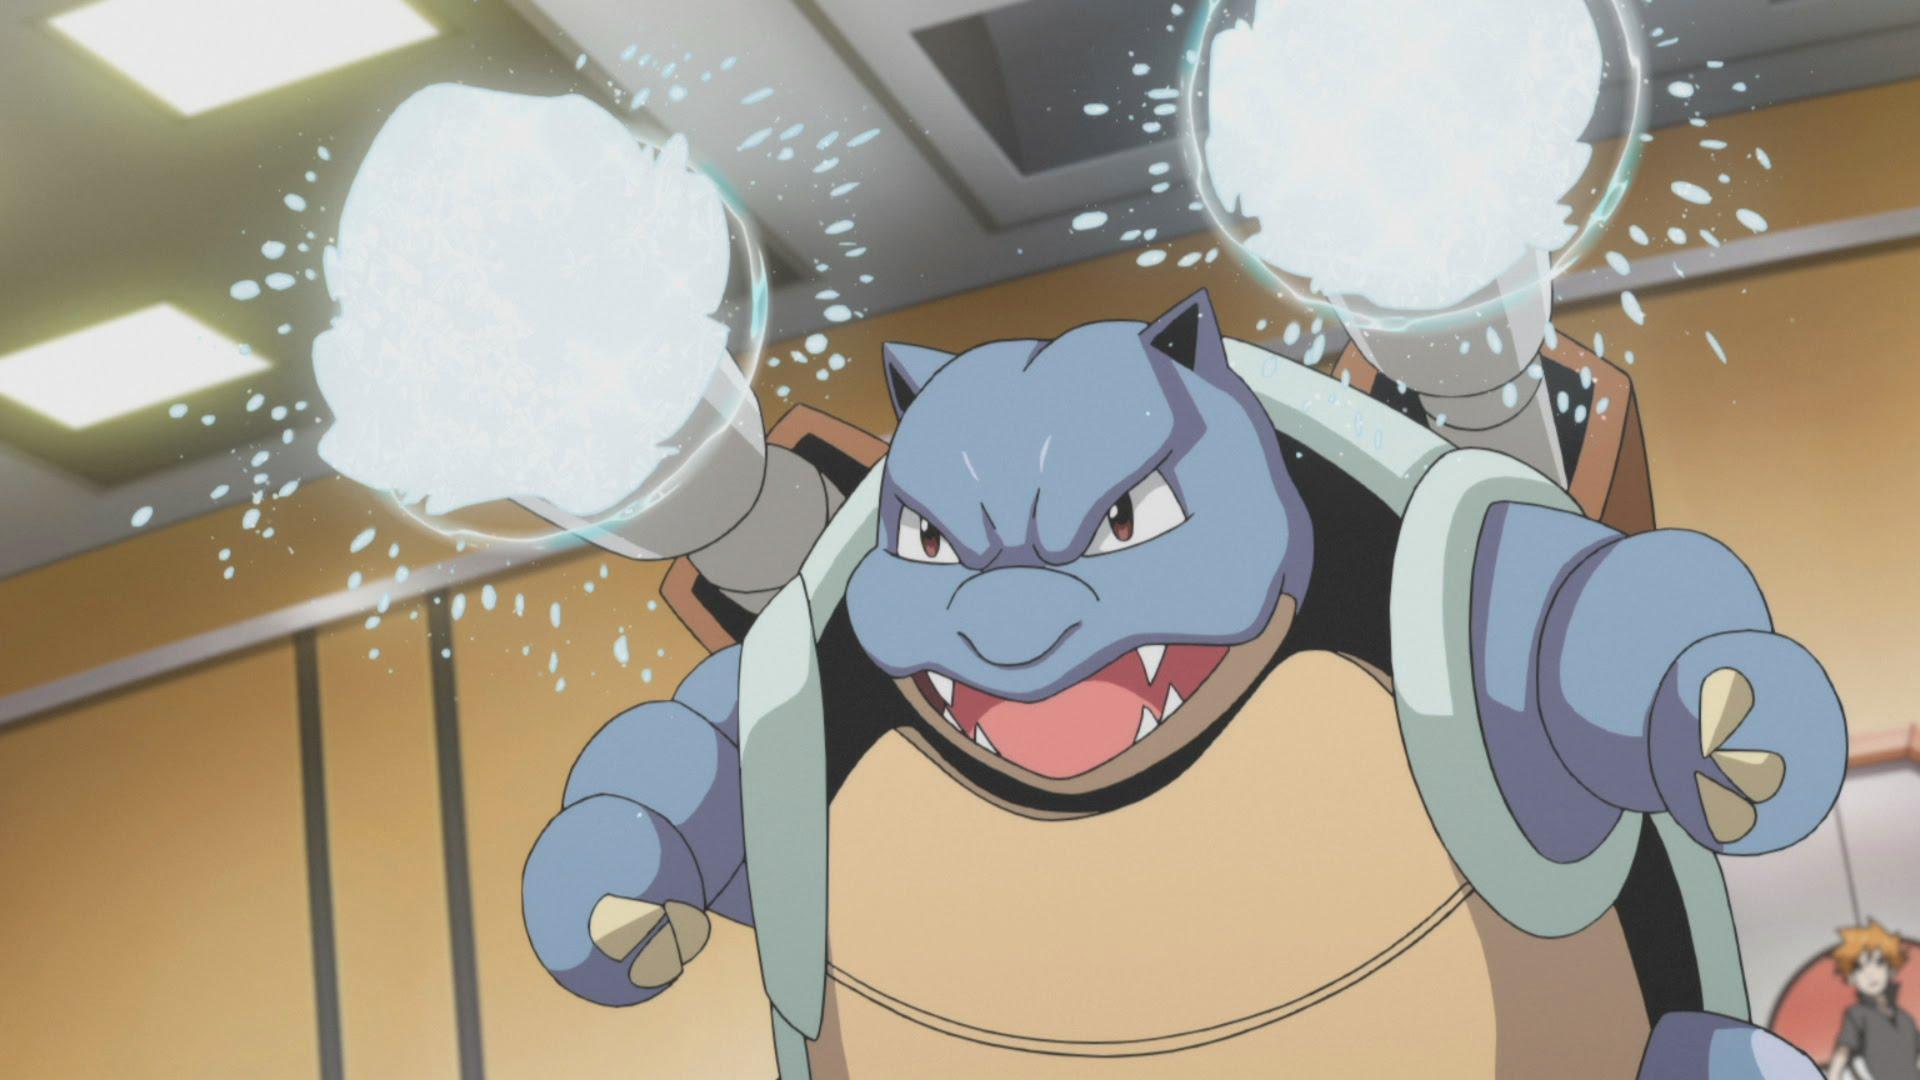 Honoree - Pokémon Generations